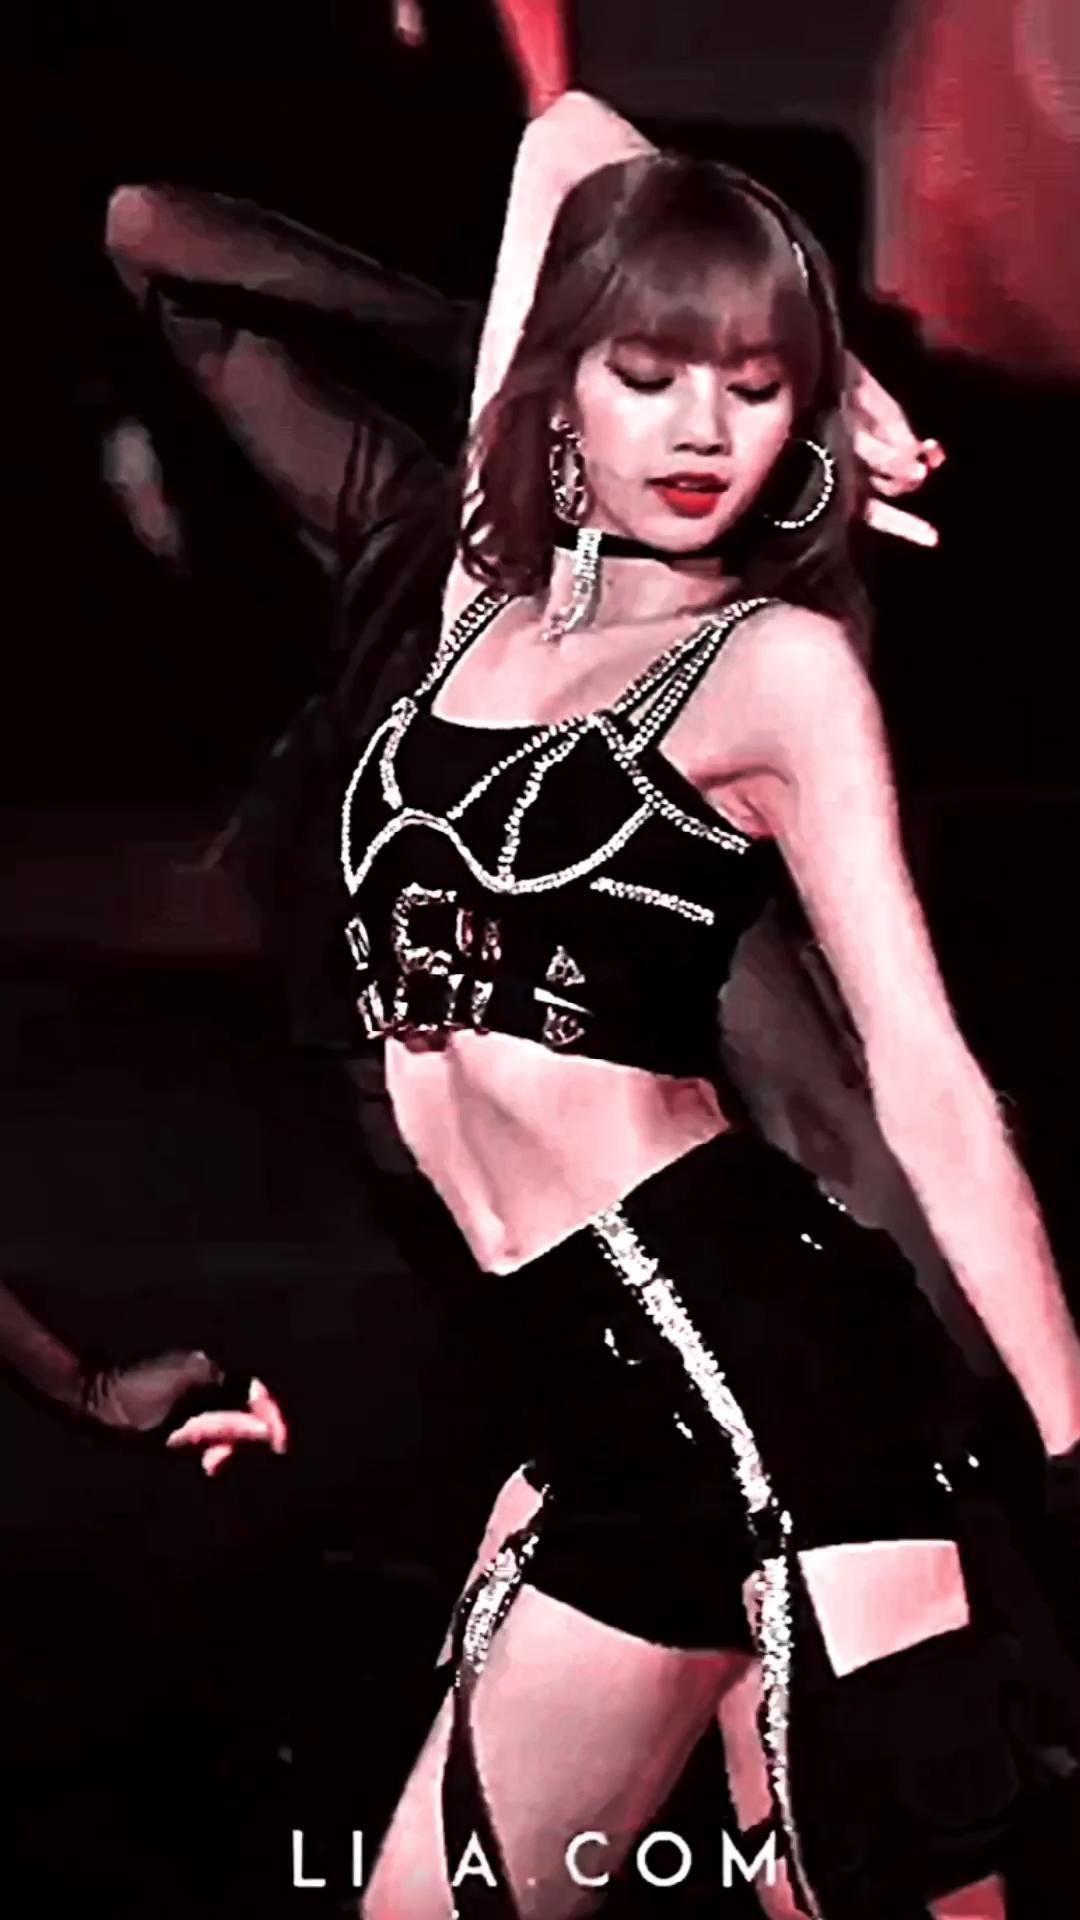 #lalisa #lisa #lisamanoban #blackpink #velocity #edits #fancam #kpop USE CREDIT FREE